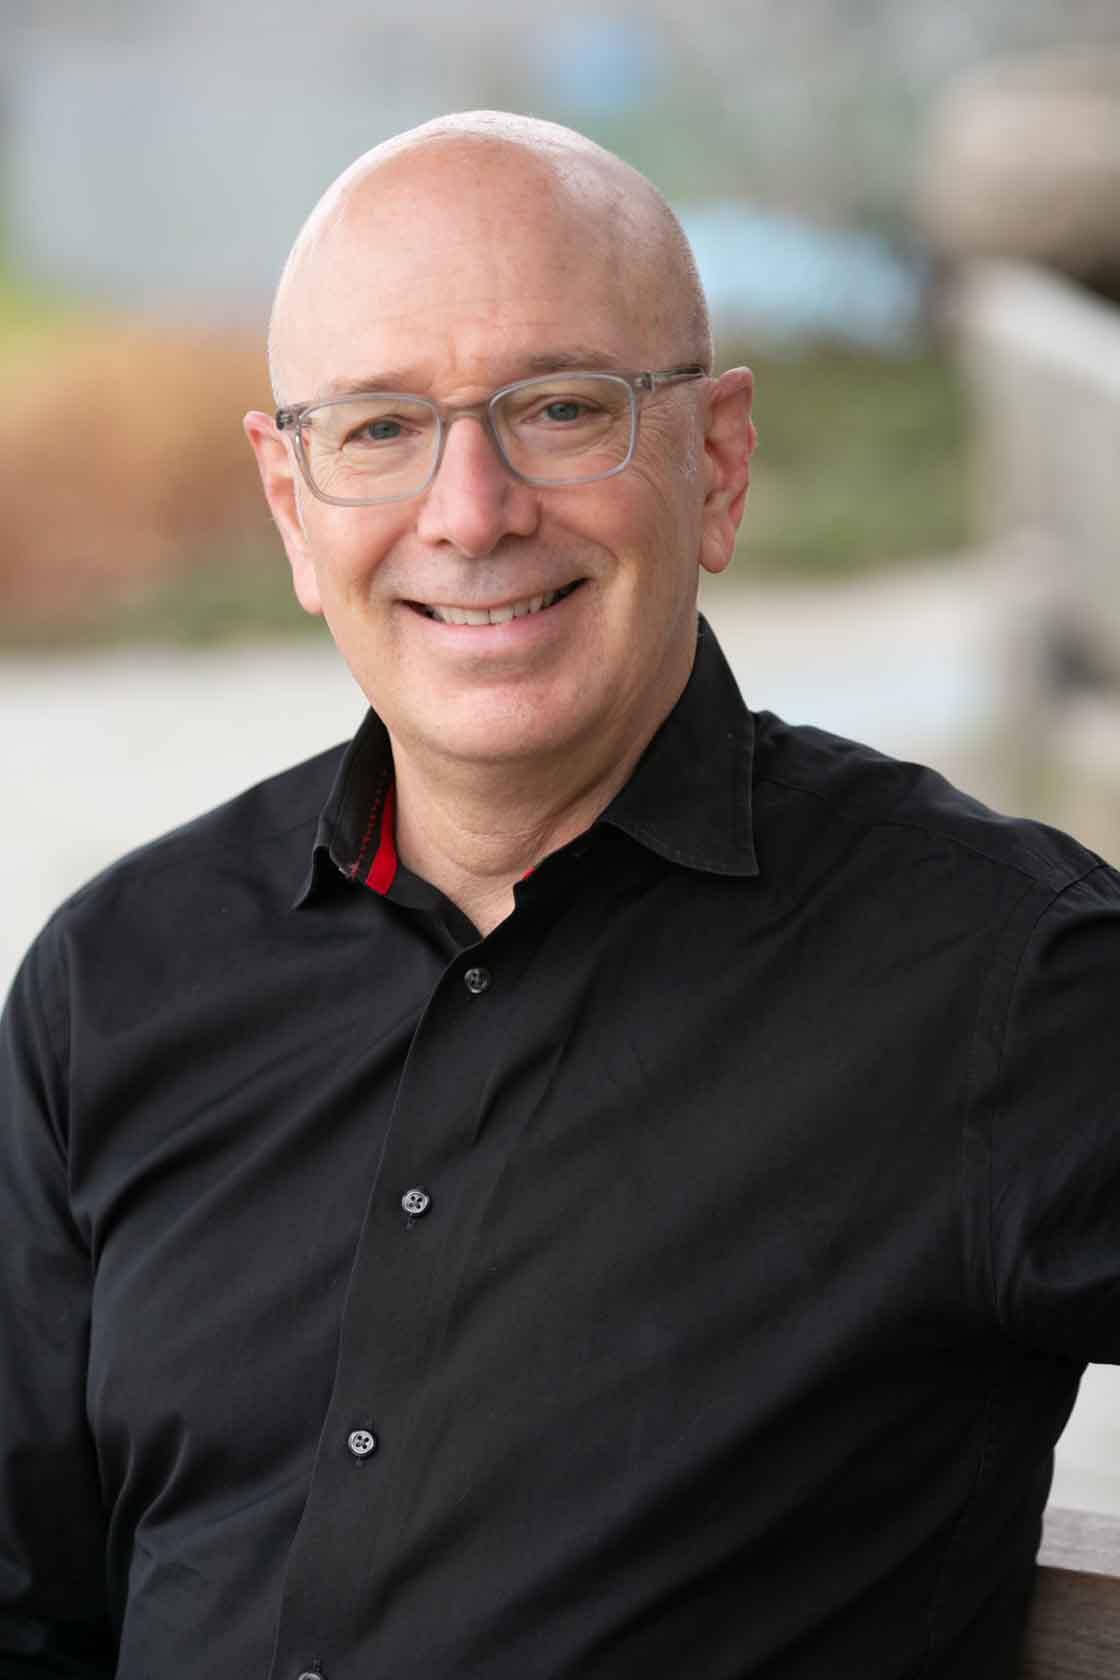 Headshot of Dr. Geoghegan, dentist in north vancouver